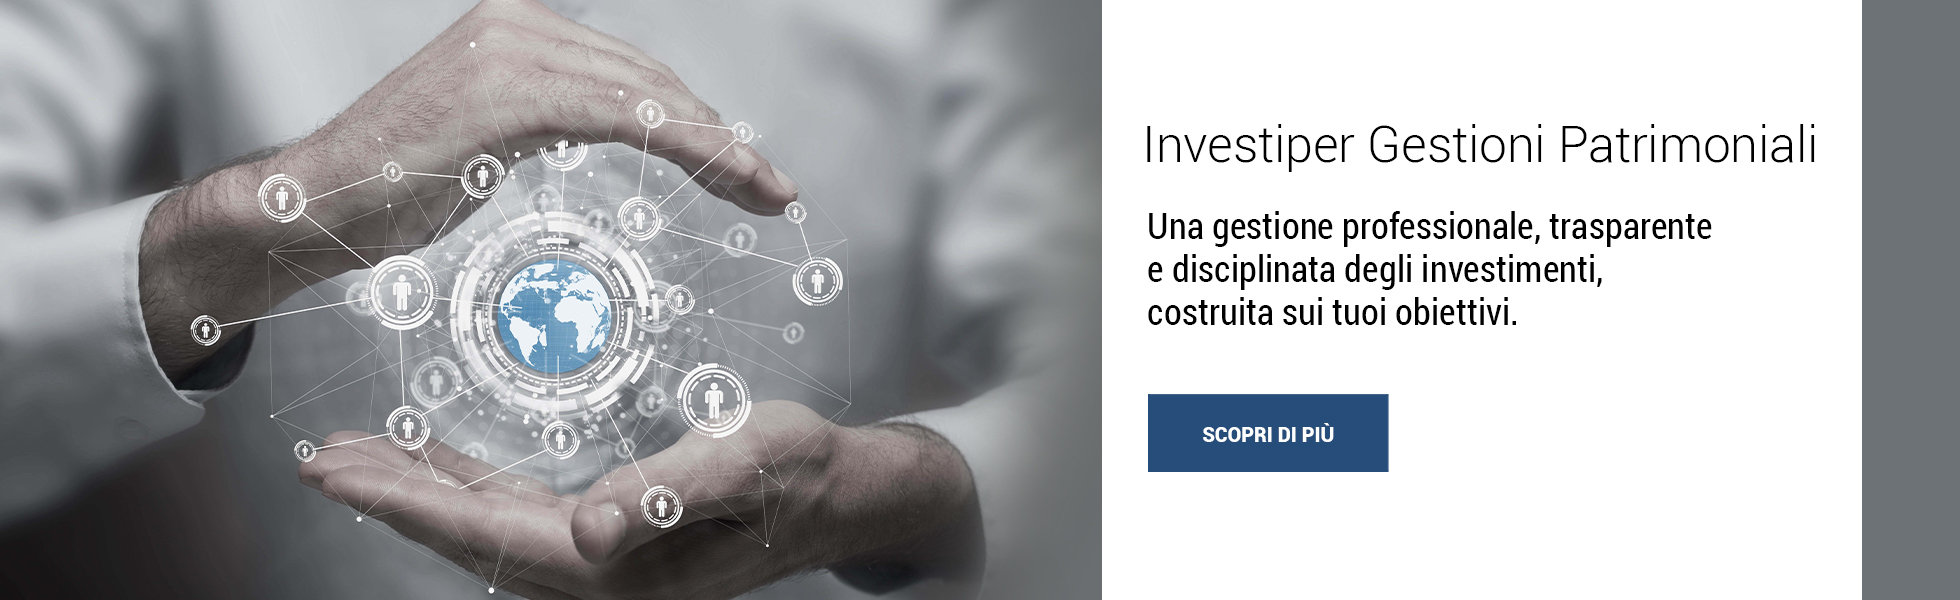 Investiper Gestioni patrimoniali